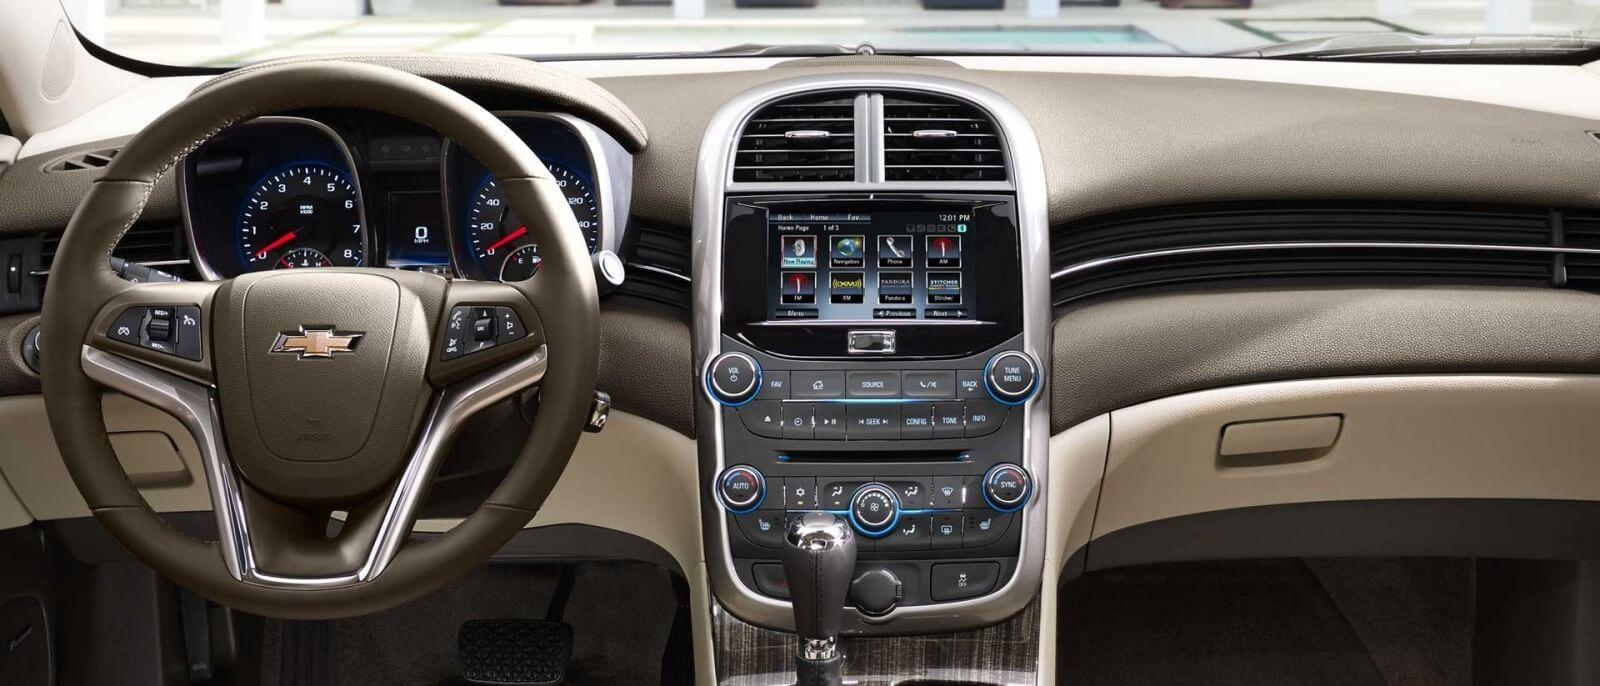 2015 Chevrolet Malibu interior